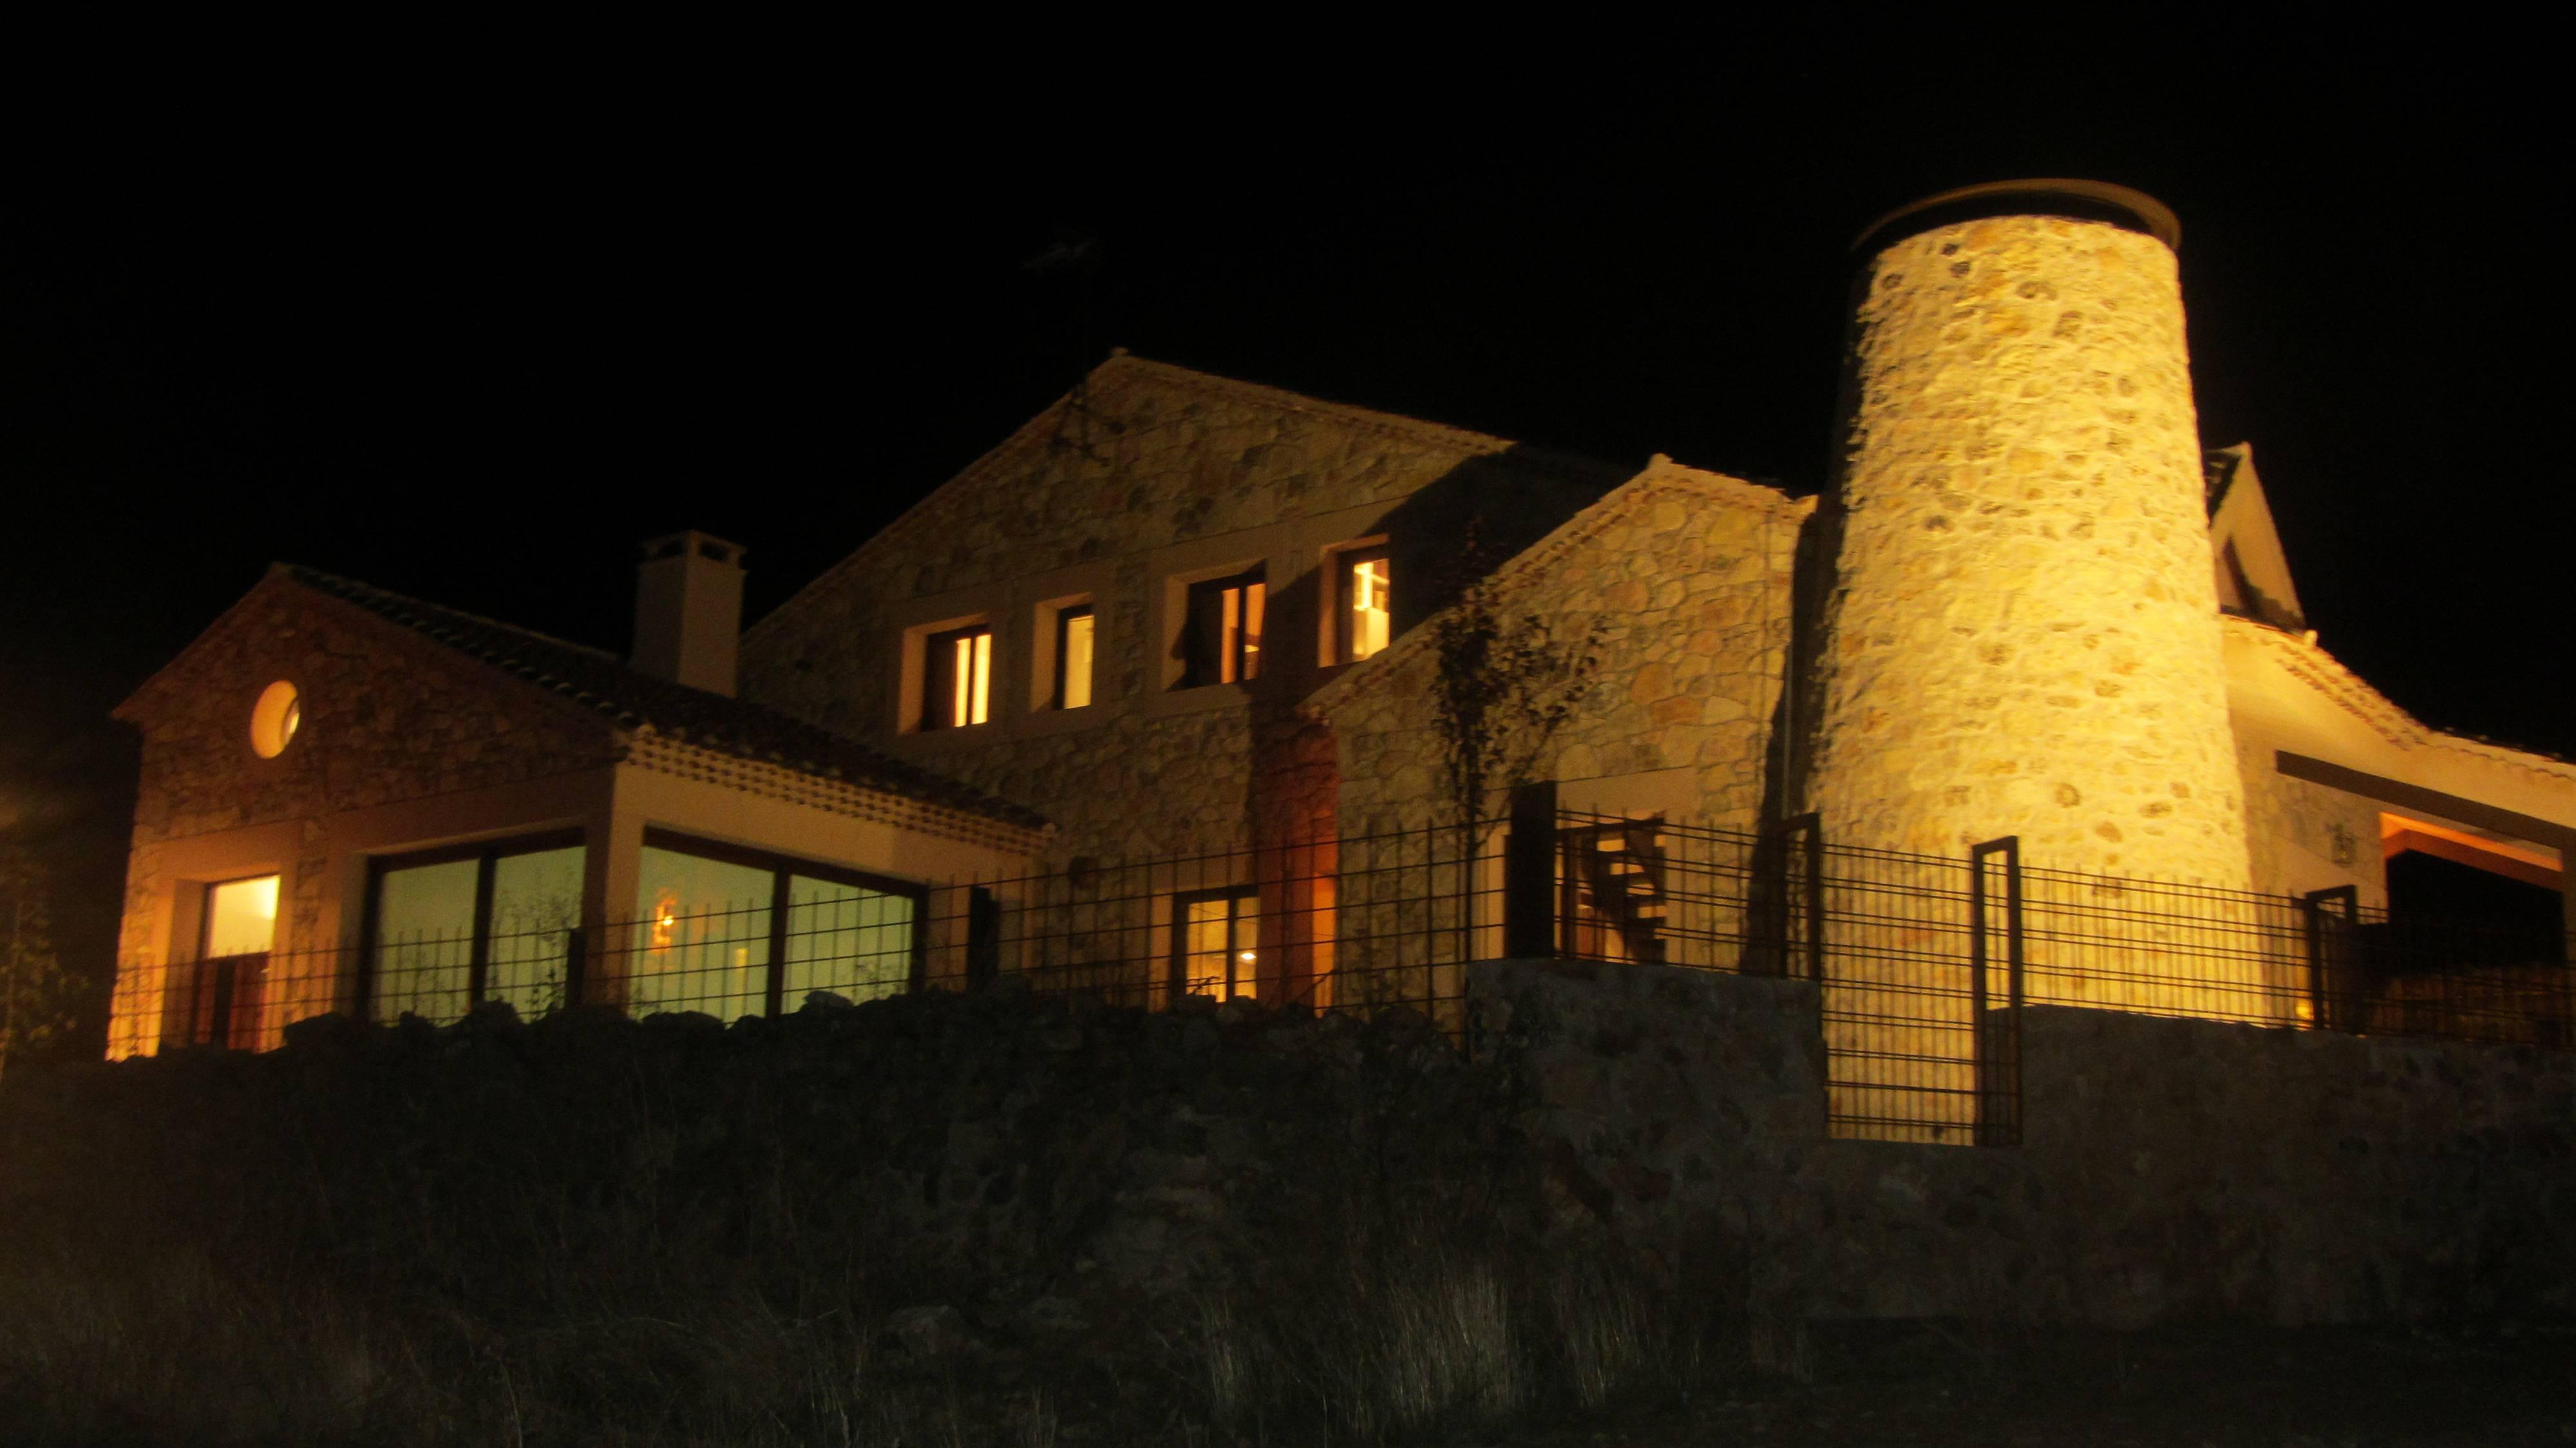 Villa lujo piscina climatizada 8 km de pedraza la matilla segovia - Piscina climatizada segovia ...